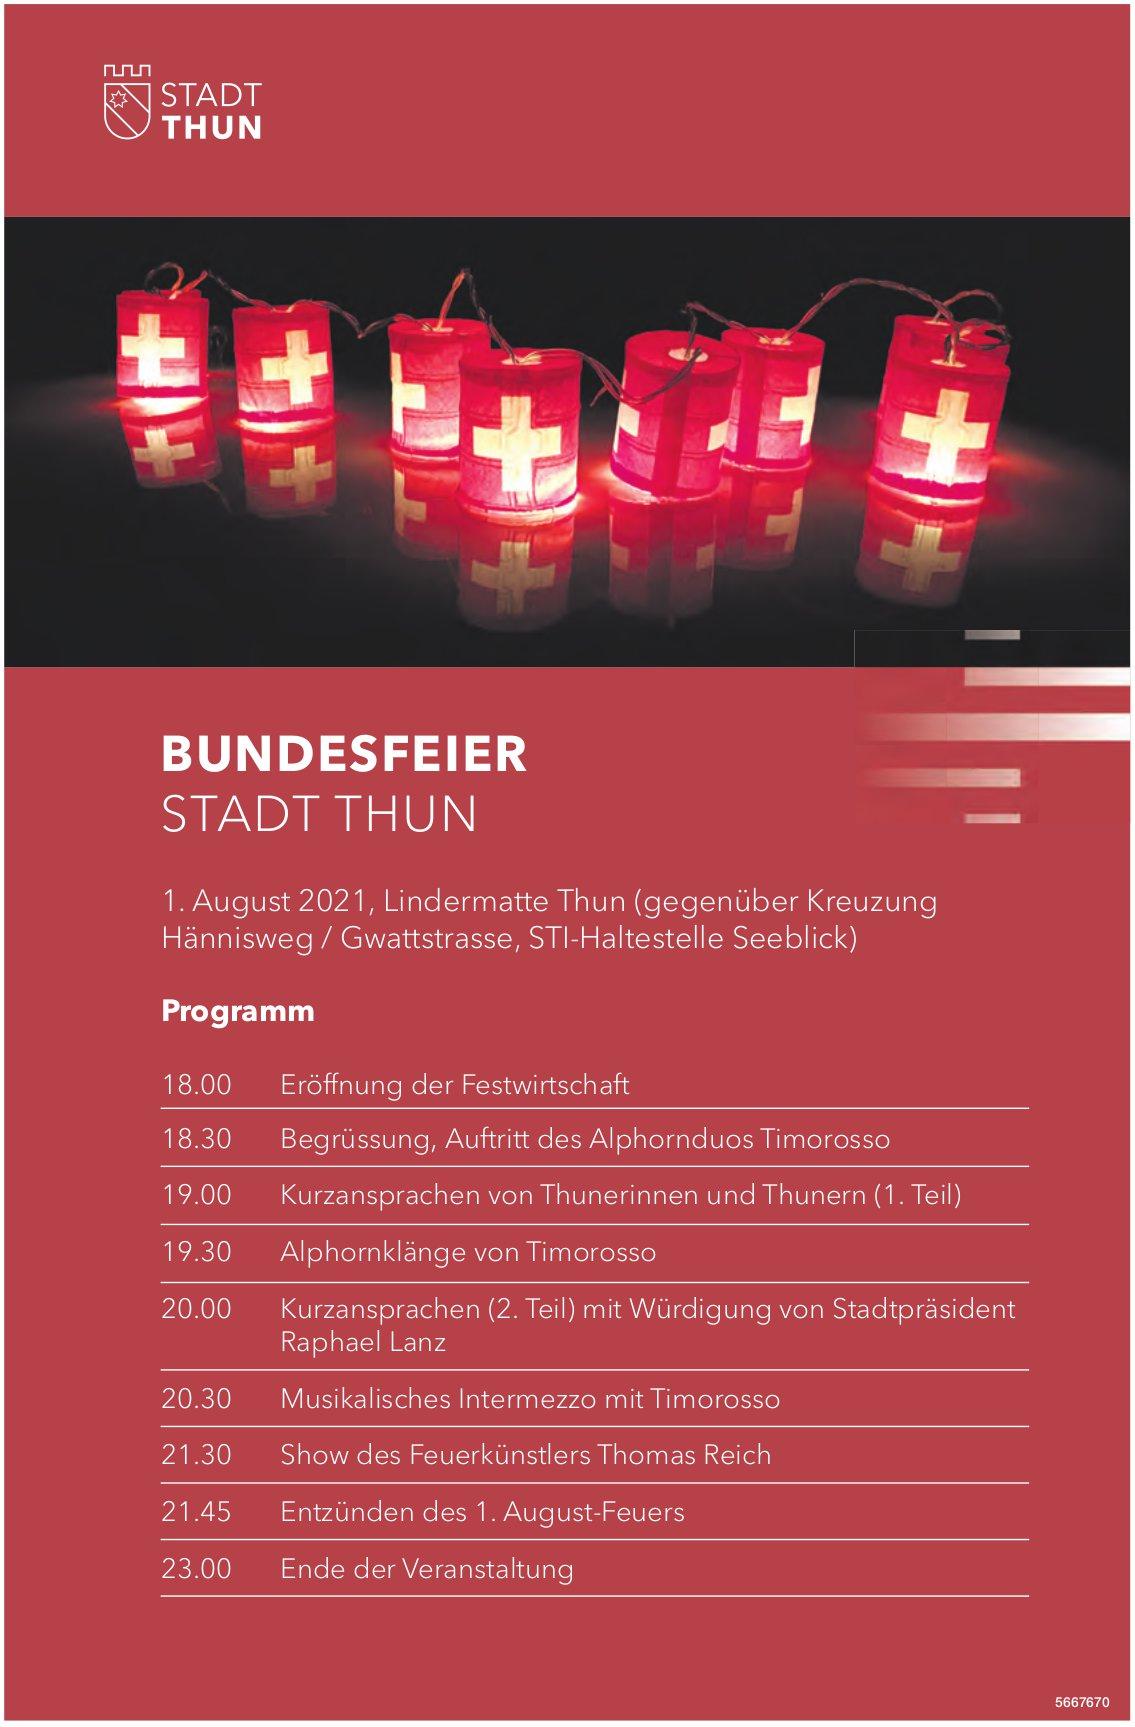 Programm Bundesfeier, 1. August, Stadt Thun